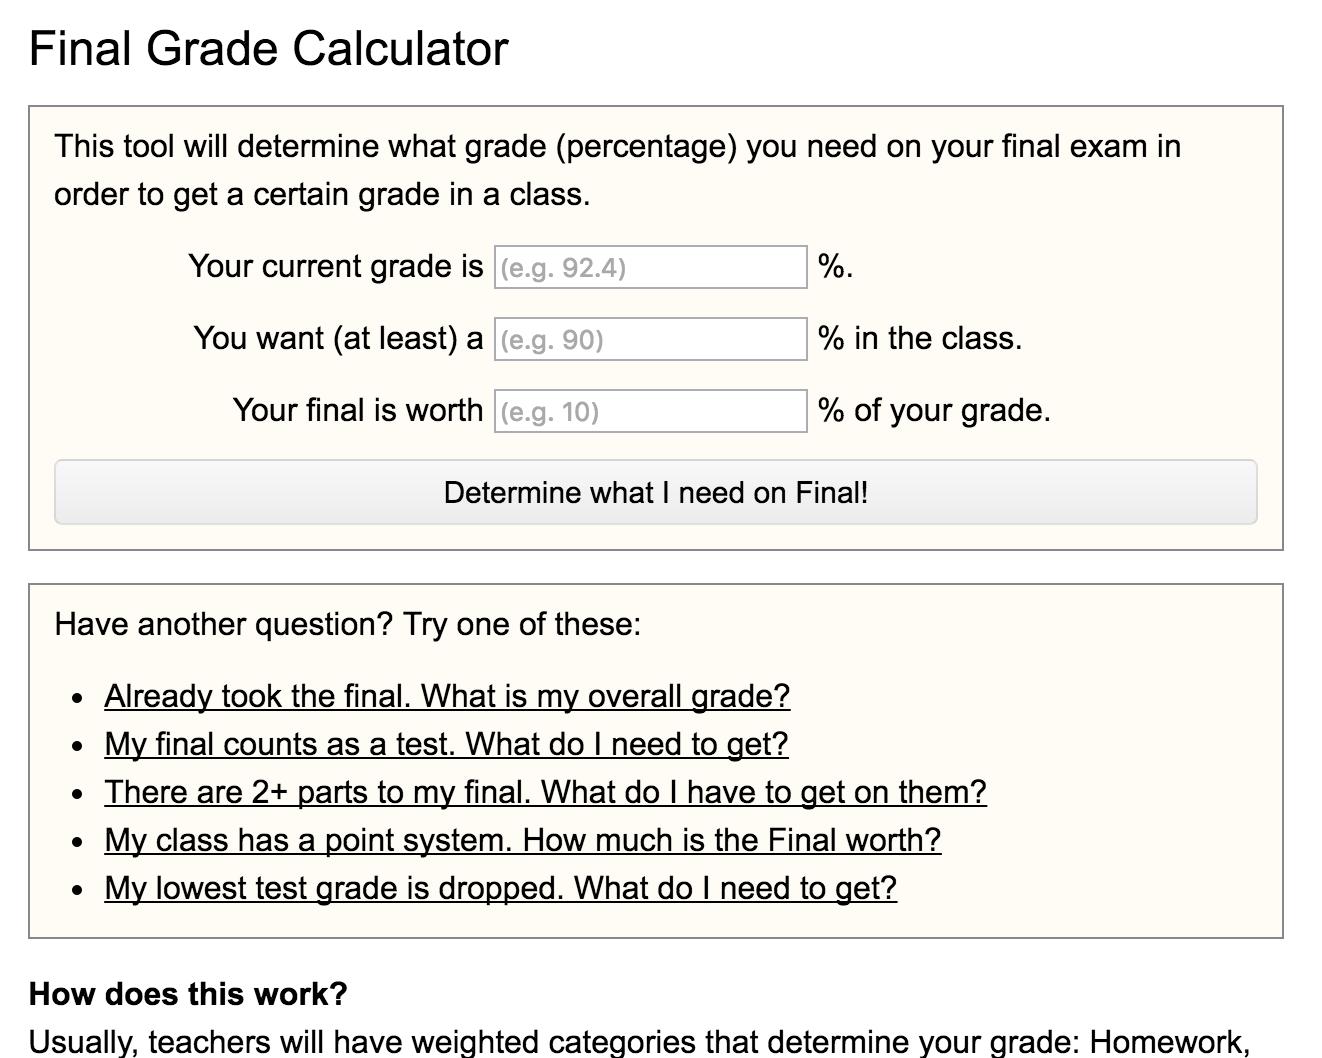 Final Grade Calculator Preview